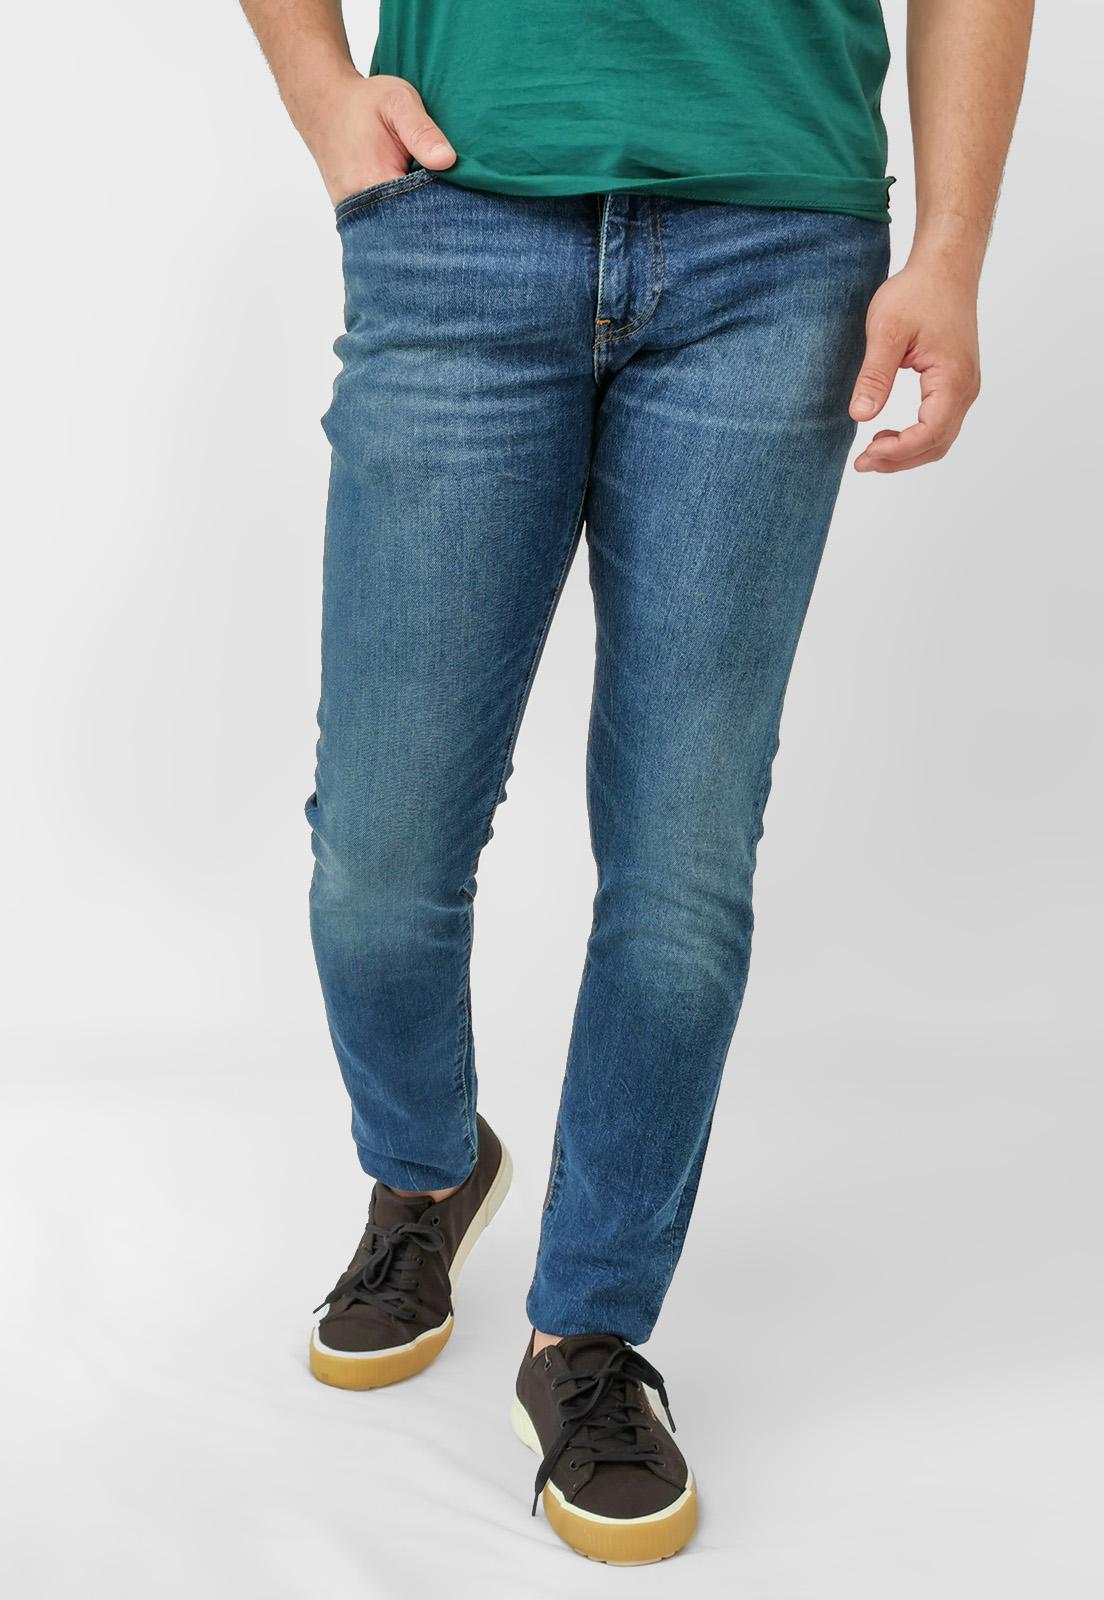 Calça Jeans Levi's Slim Taper